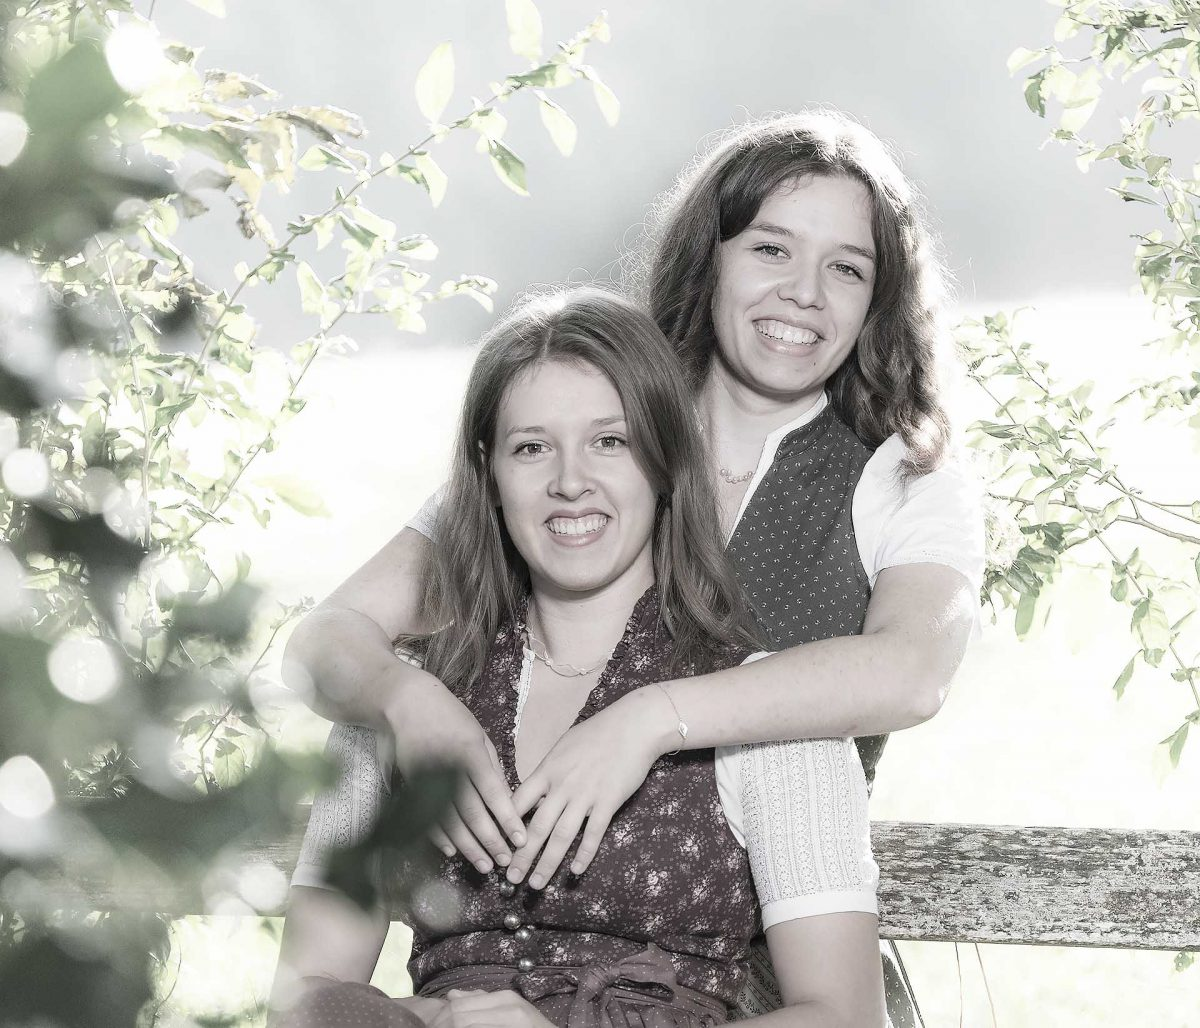 Hochzeit-shooting-fotograf-tegensee-schliersee-andreas-leder Familien Shooting